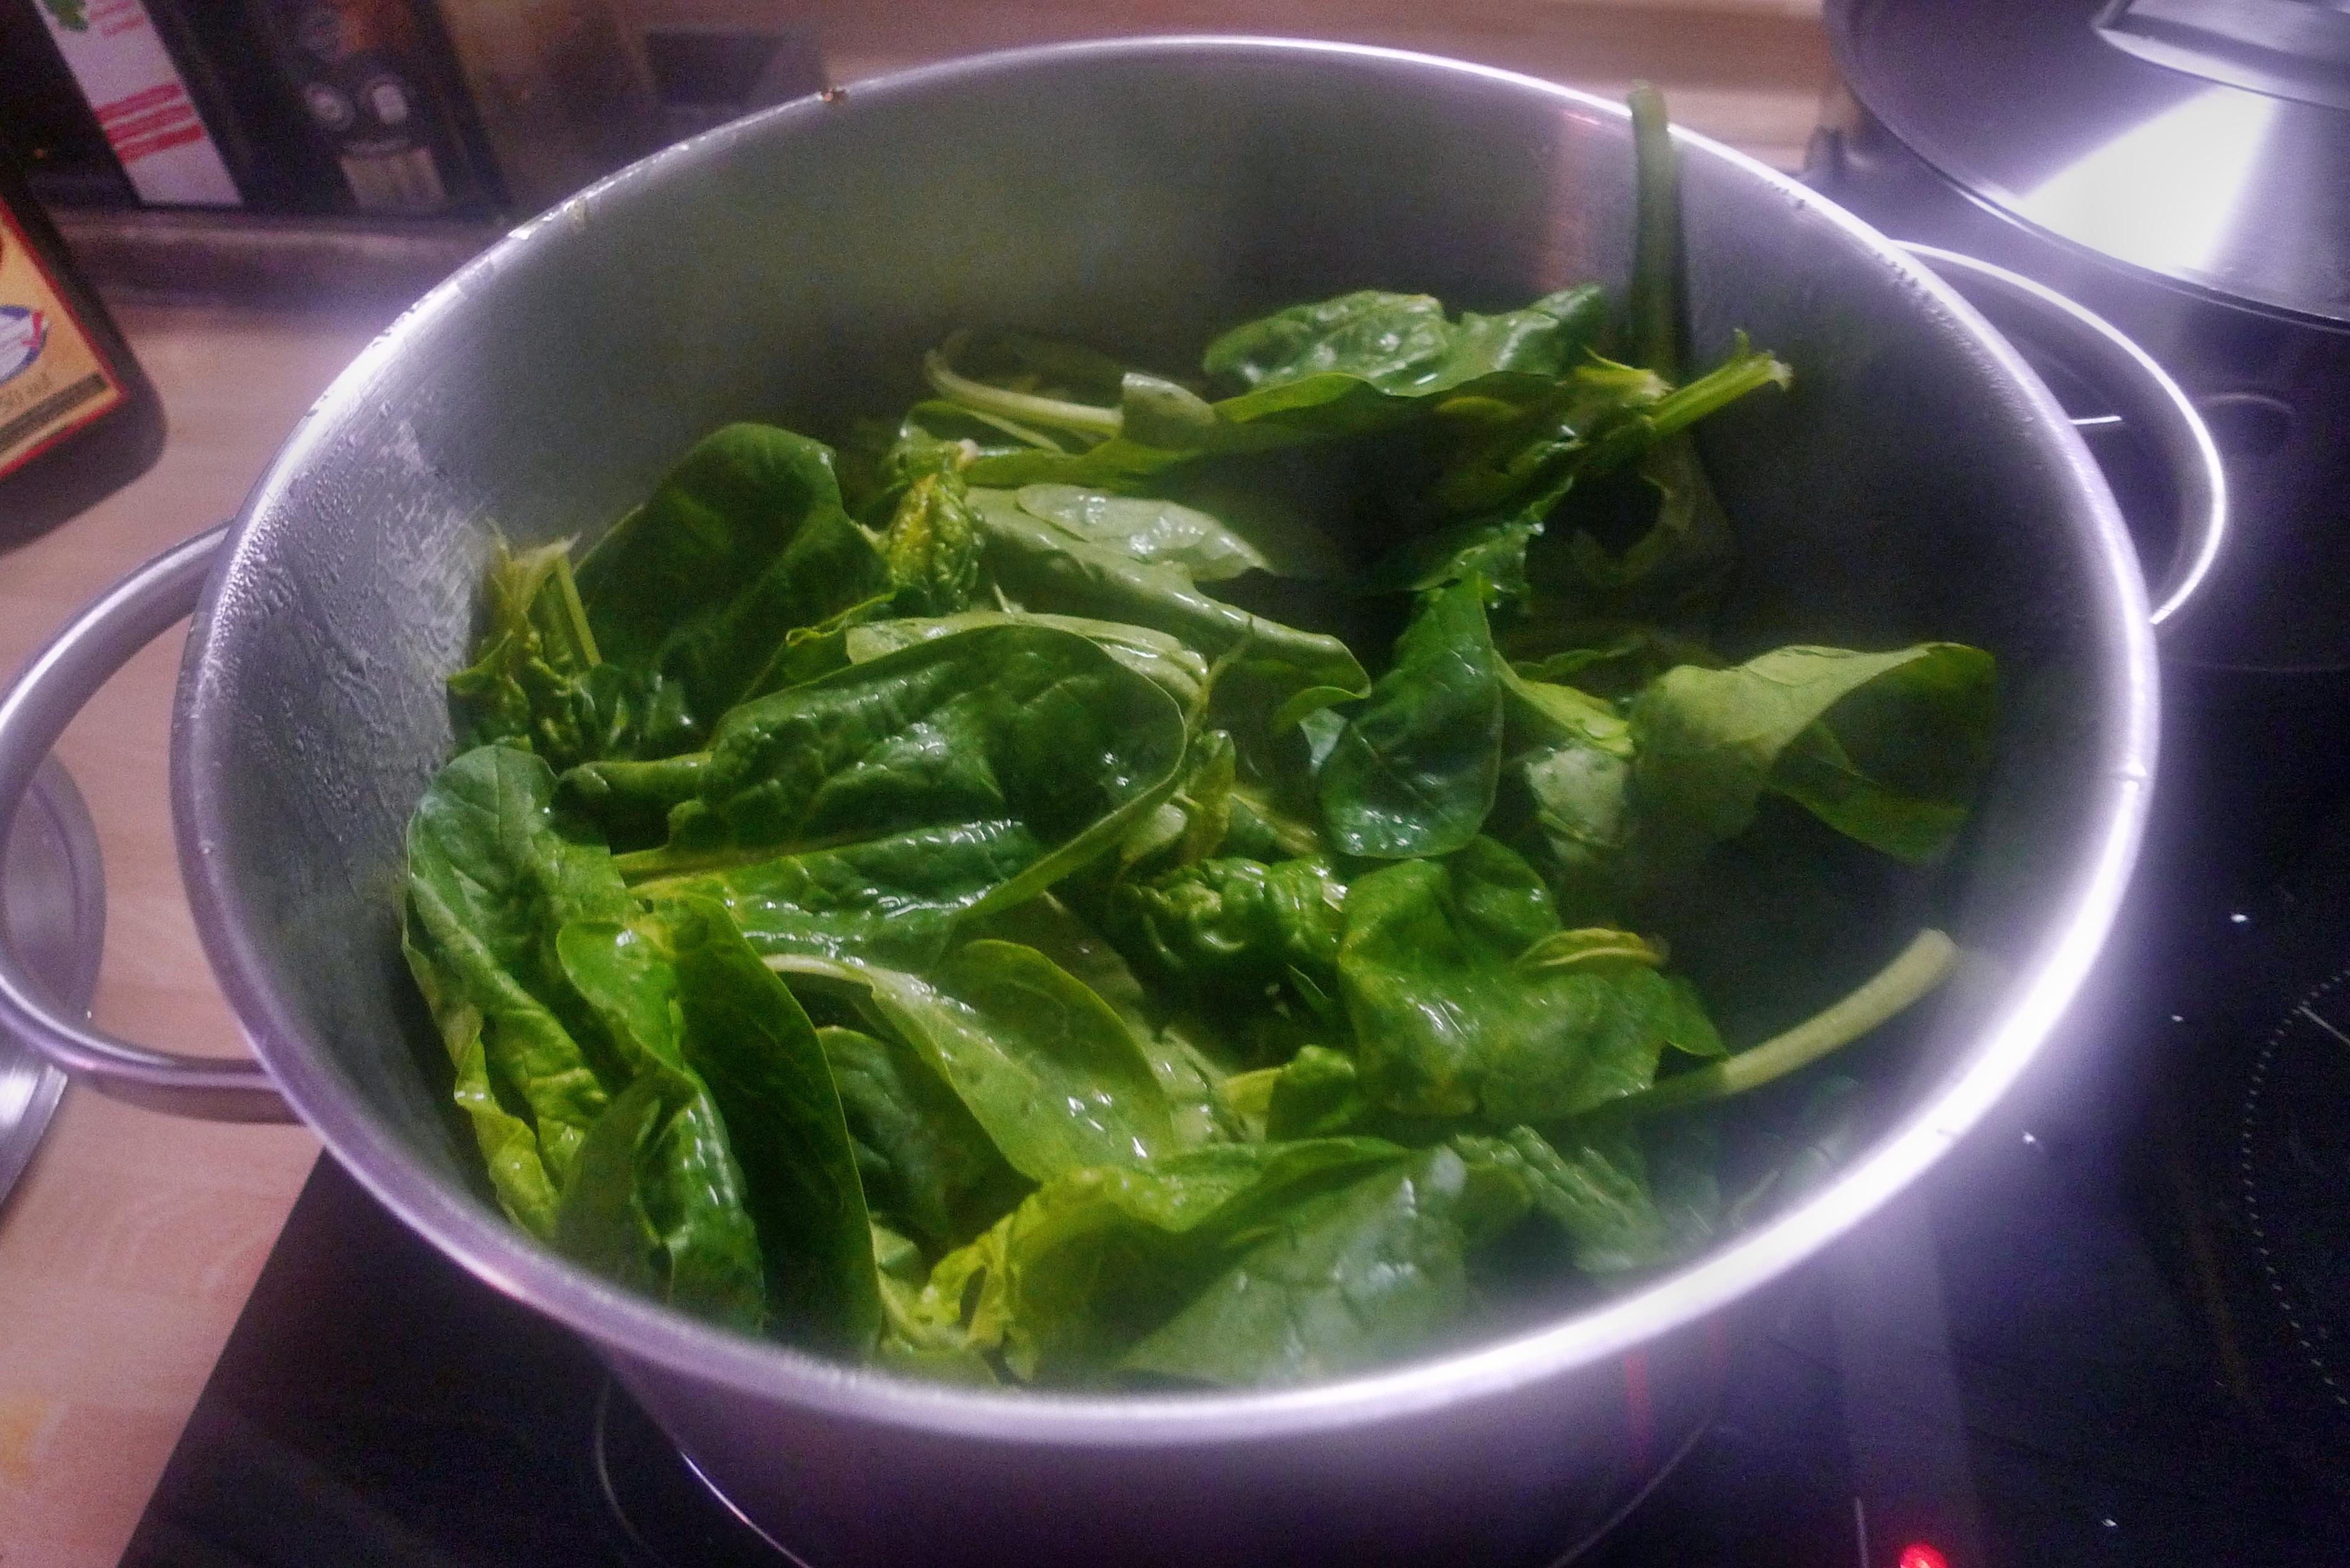 Spinat mit Nudeln-Apfel im Schlafrock -25.10.14   (2a) (5)